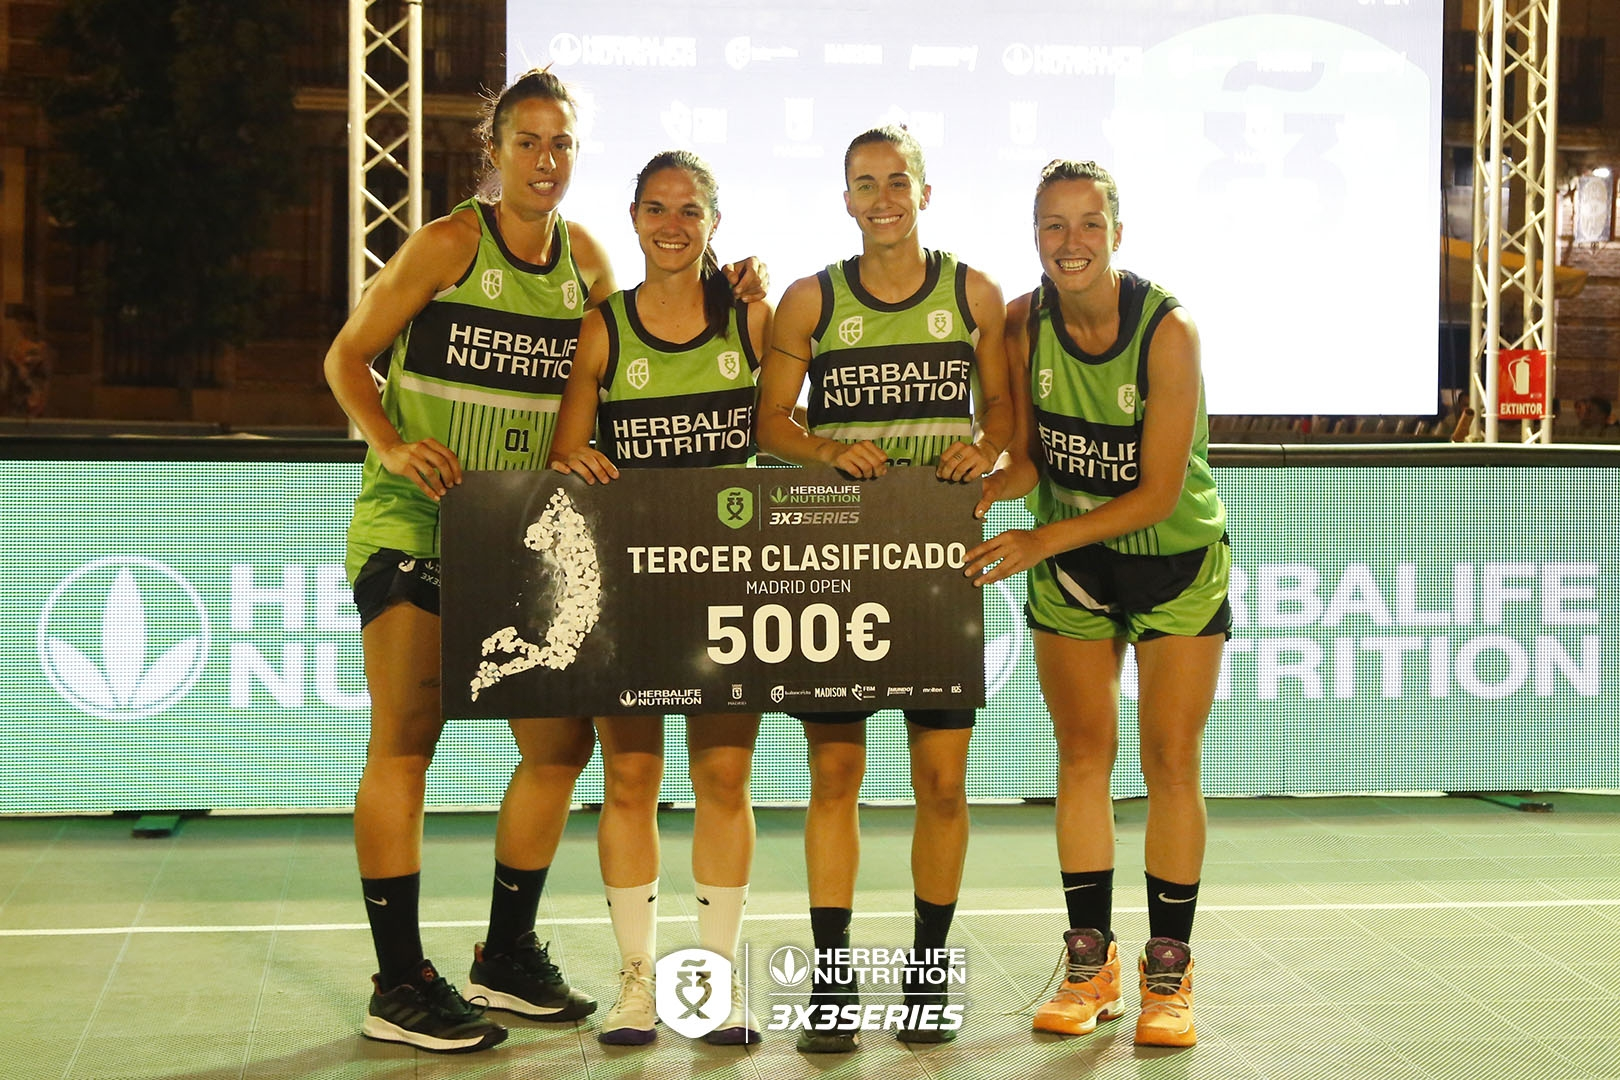 MadridOpen_Herbalife3x3Series2019_SABADO17